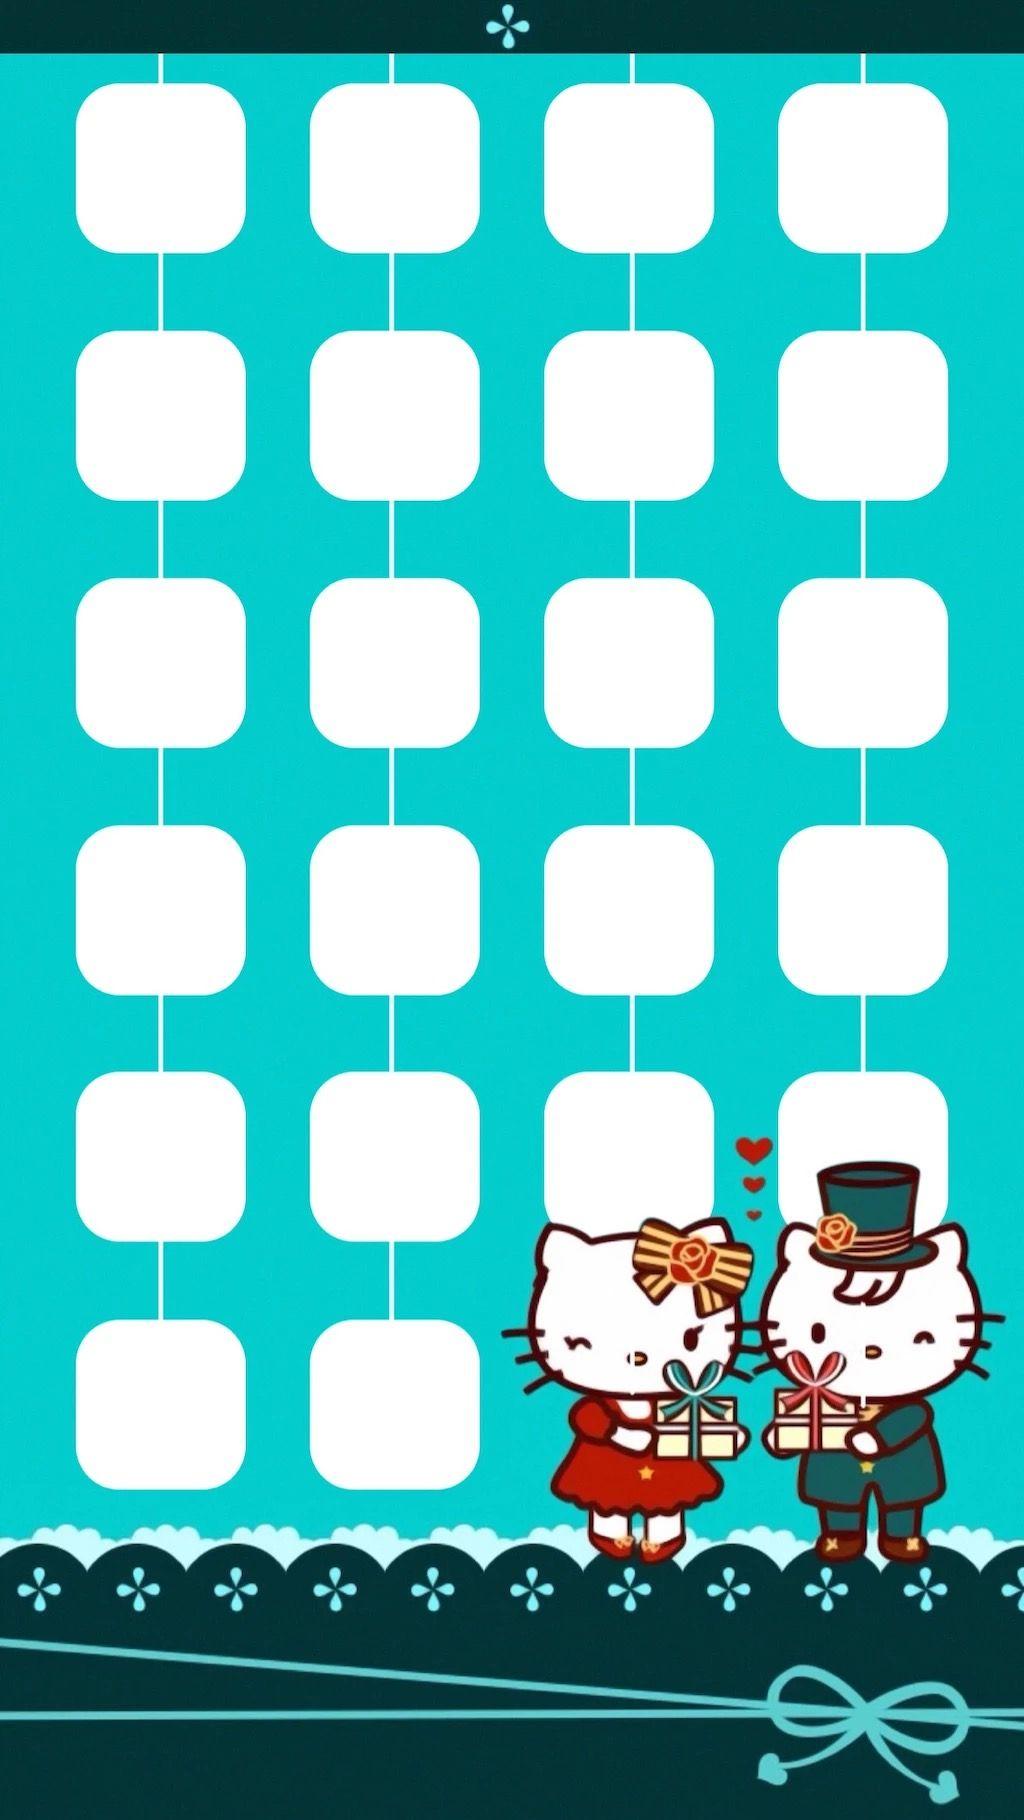 Good Wallpaper Hello Kitty Turquoise - eae500e59a232649c2056ec49efd830b  Gallery_92669.jpg